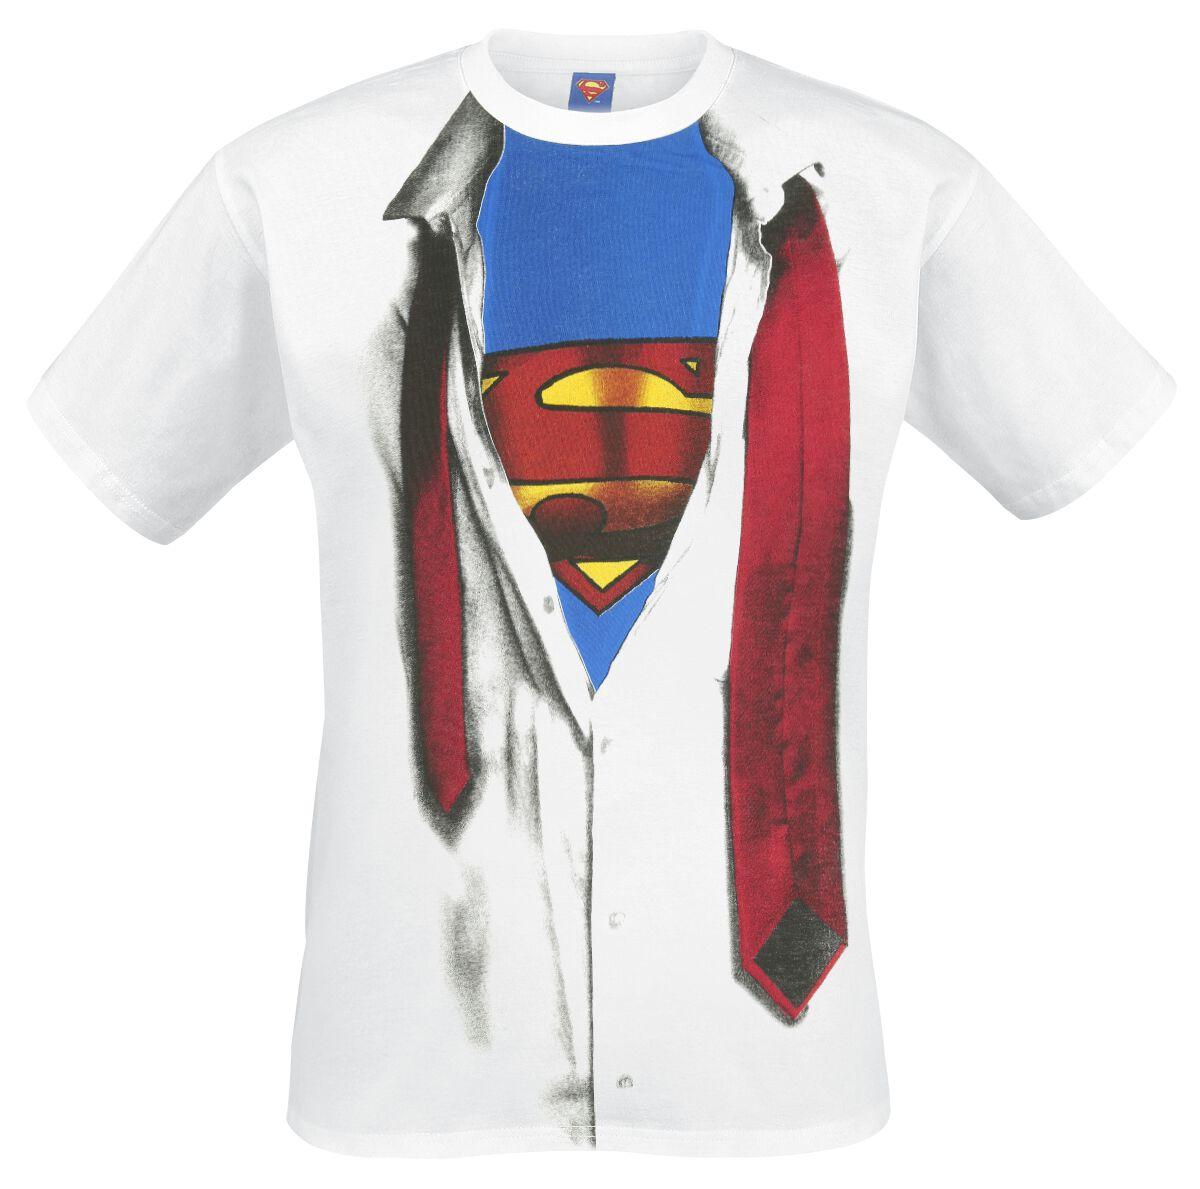 Merch dla Fanów - Koszulki - T-Shirt Superman Cosplay Shirt T-Shirt biały - 351324